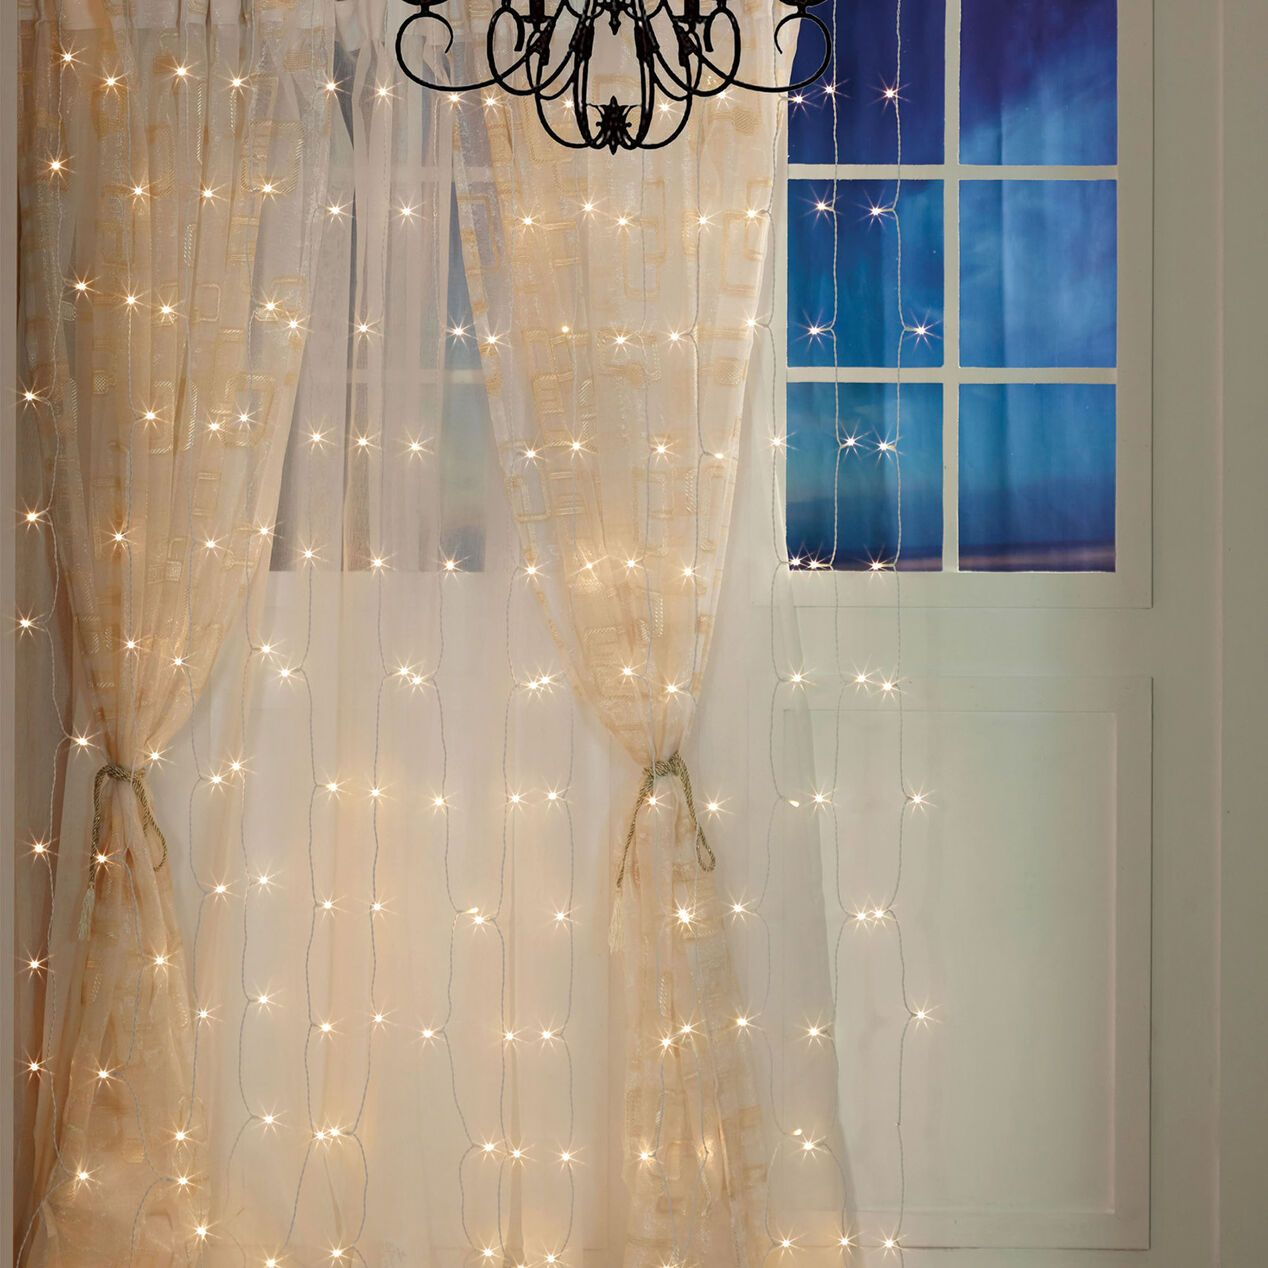 8 Led Curtain Light Set In 2020 Curtain Lights Led Curtain Curtains